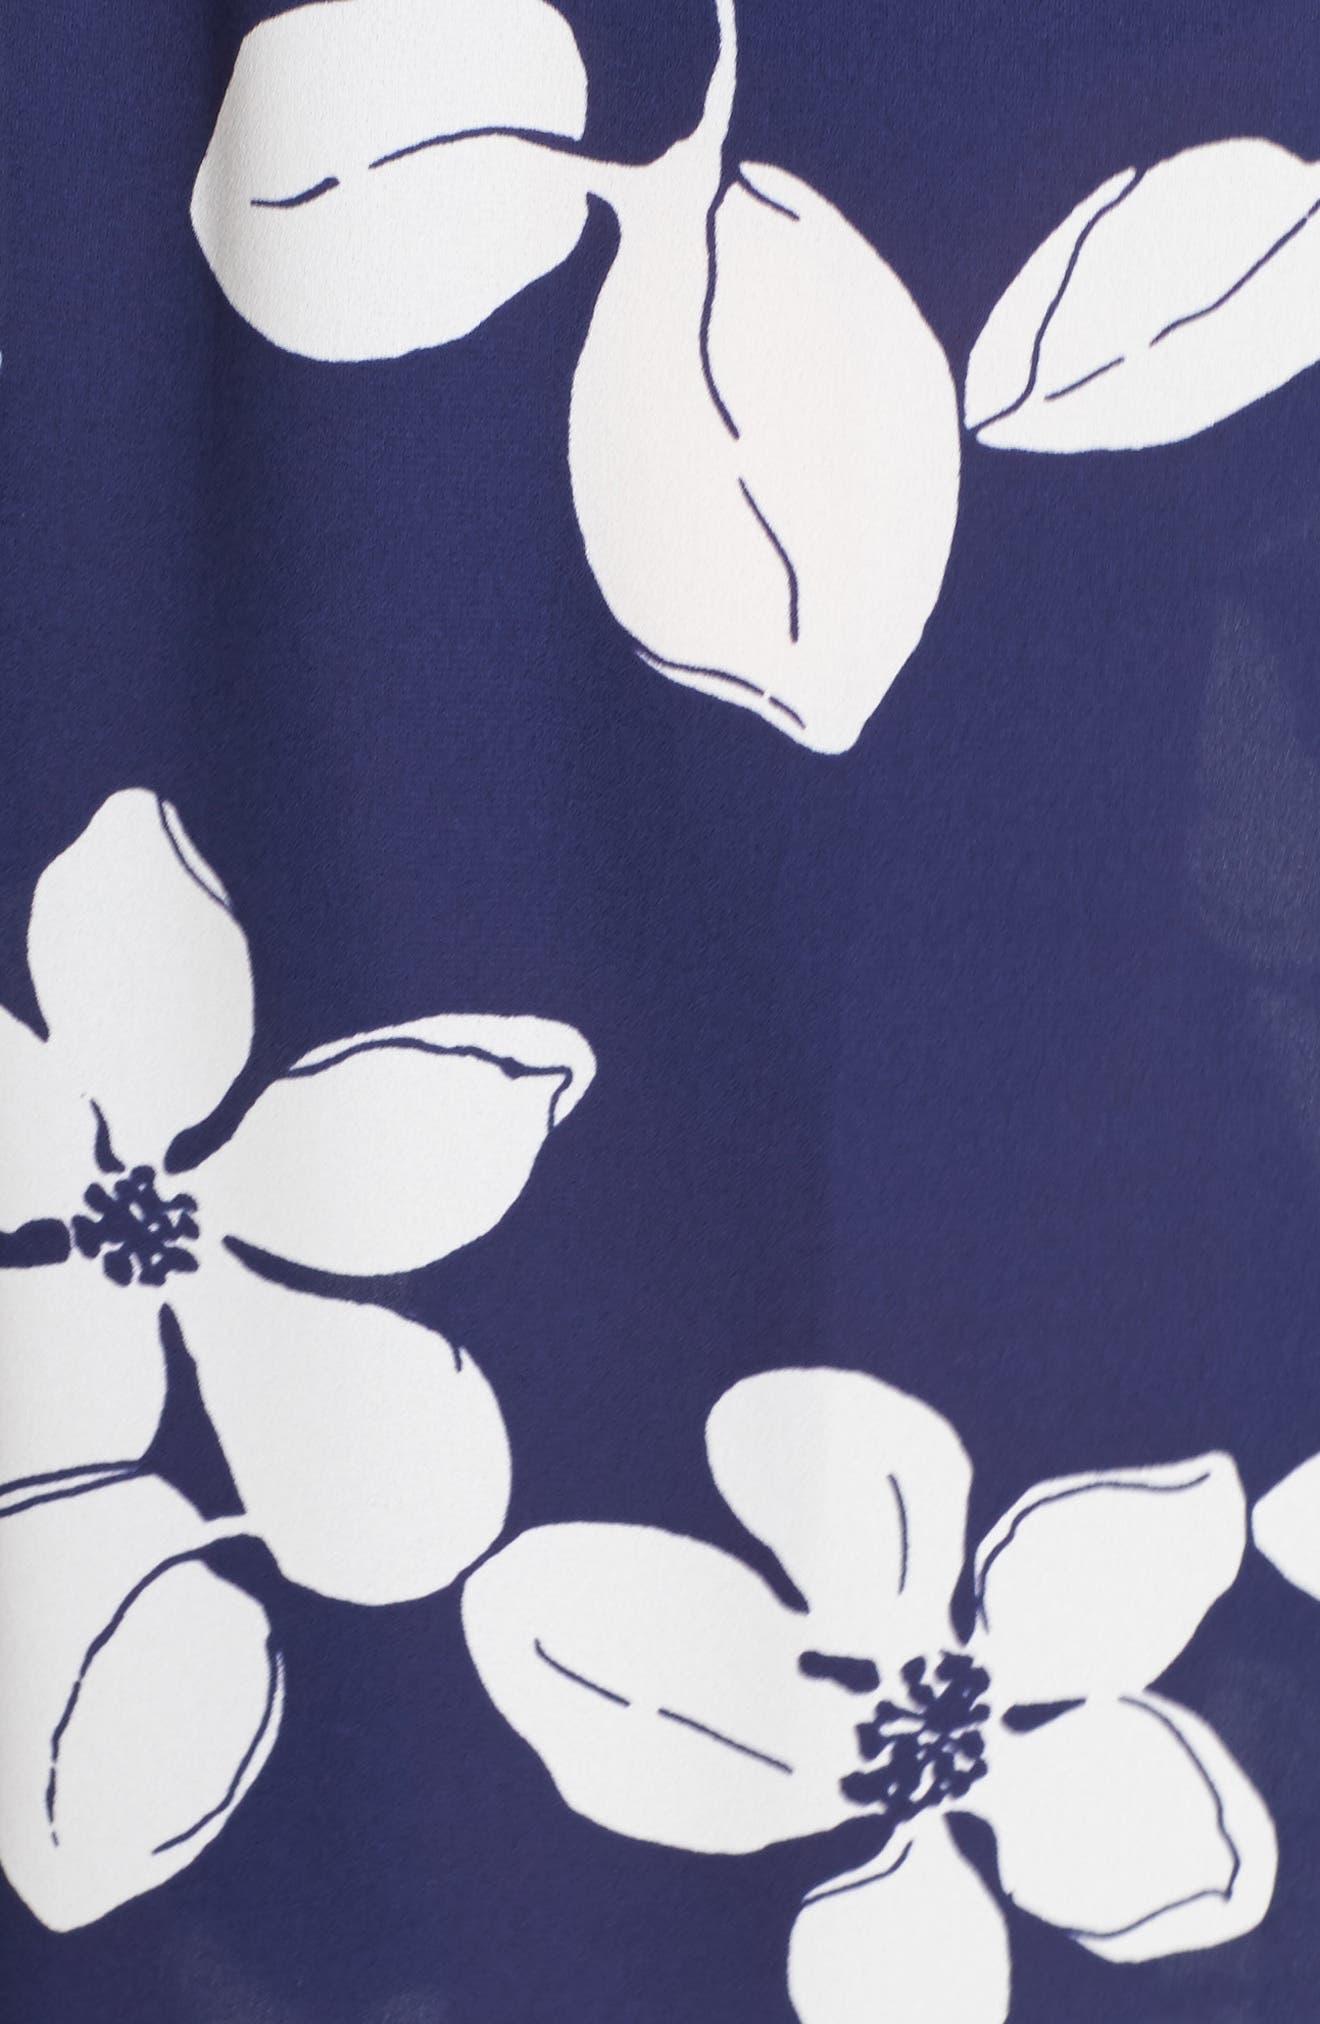 Off the Shoulder Ruffle Maxi Dress,                             Alternate thumbnail 5, color,                             400